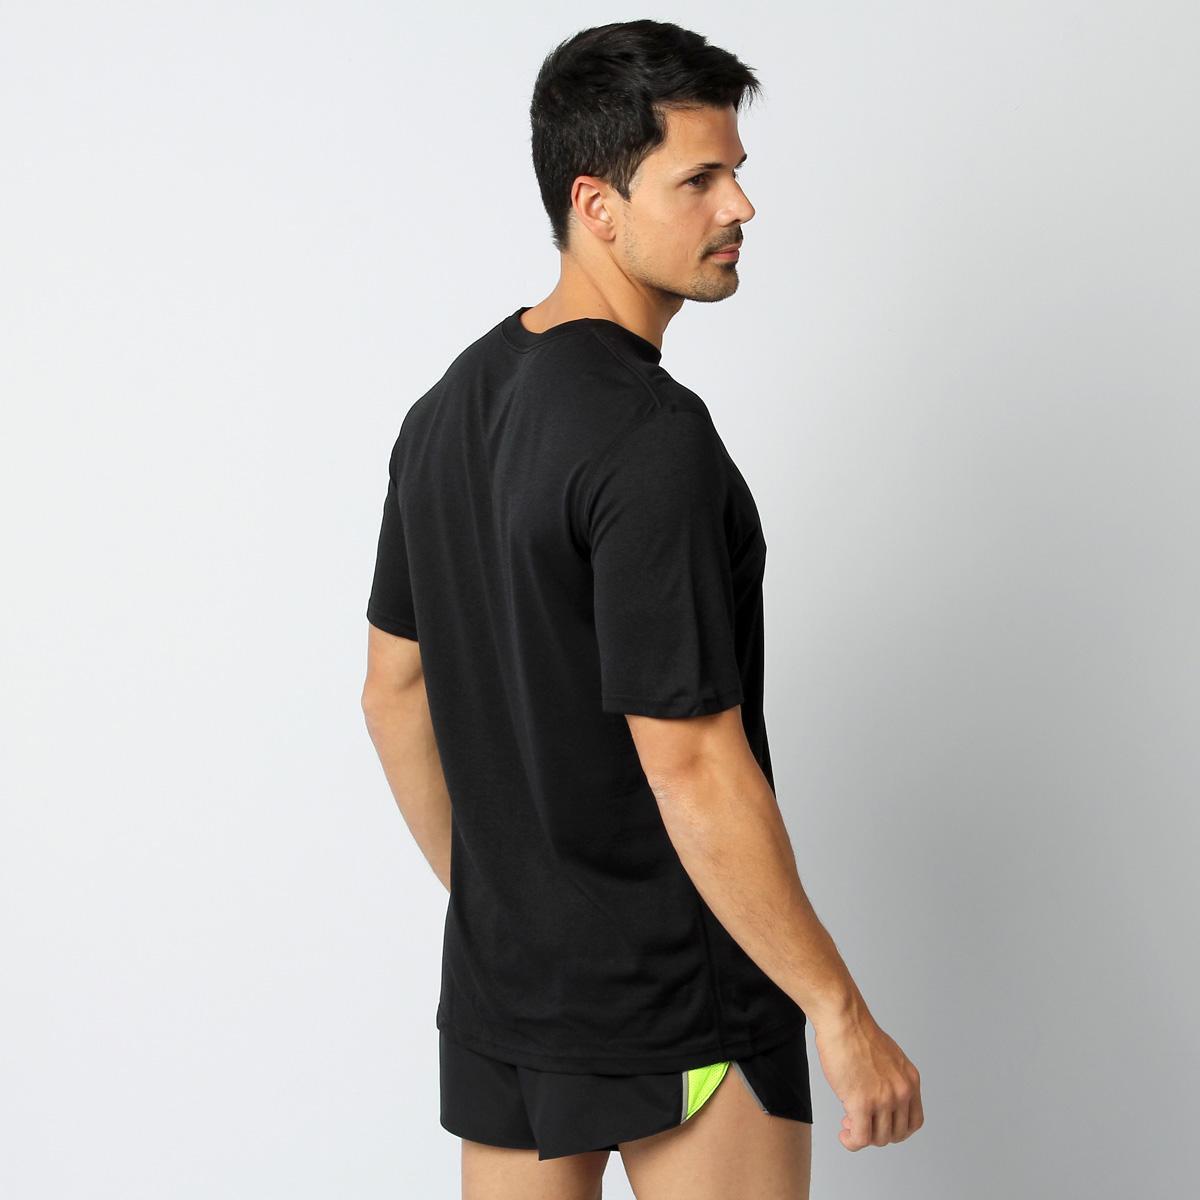 Camiseta Nike Legend  Camiseta Nike Legend ... 4f39bdb38839a